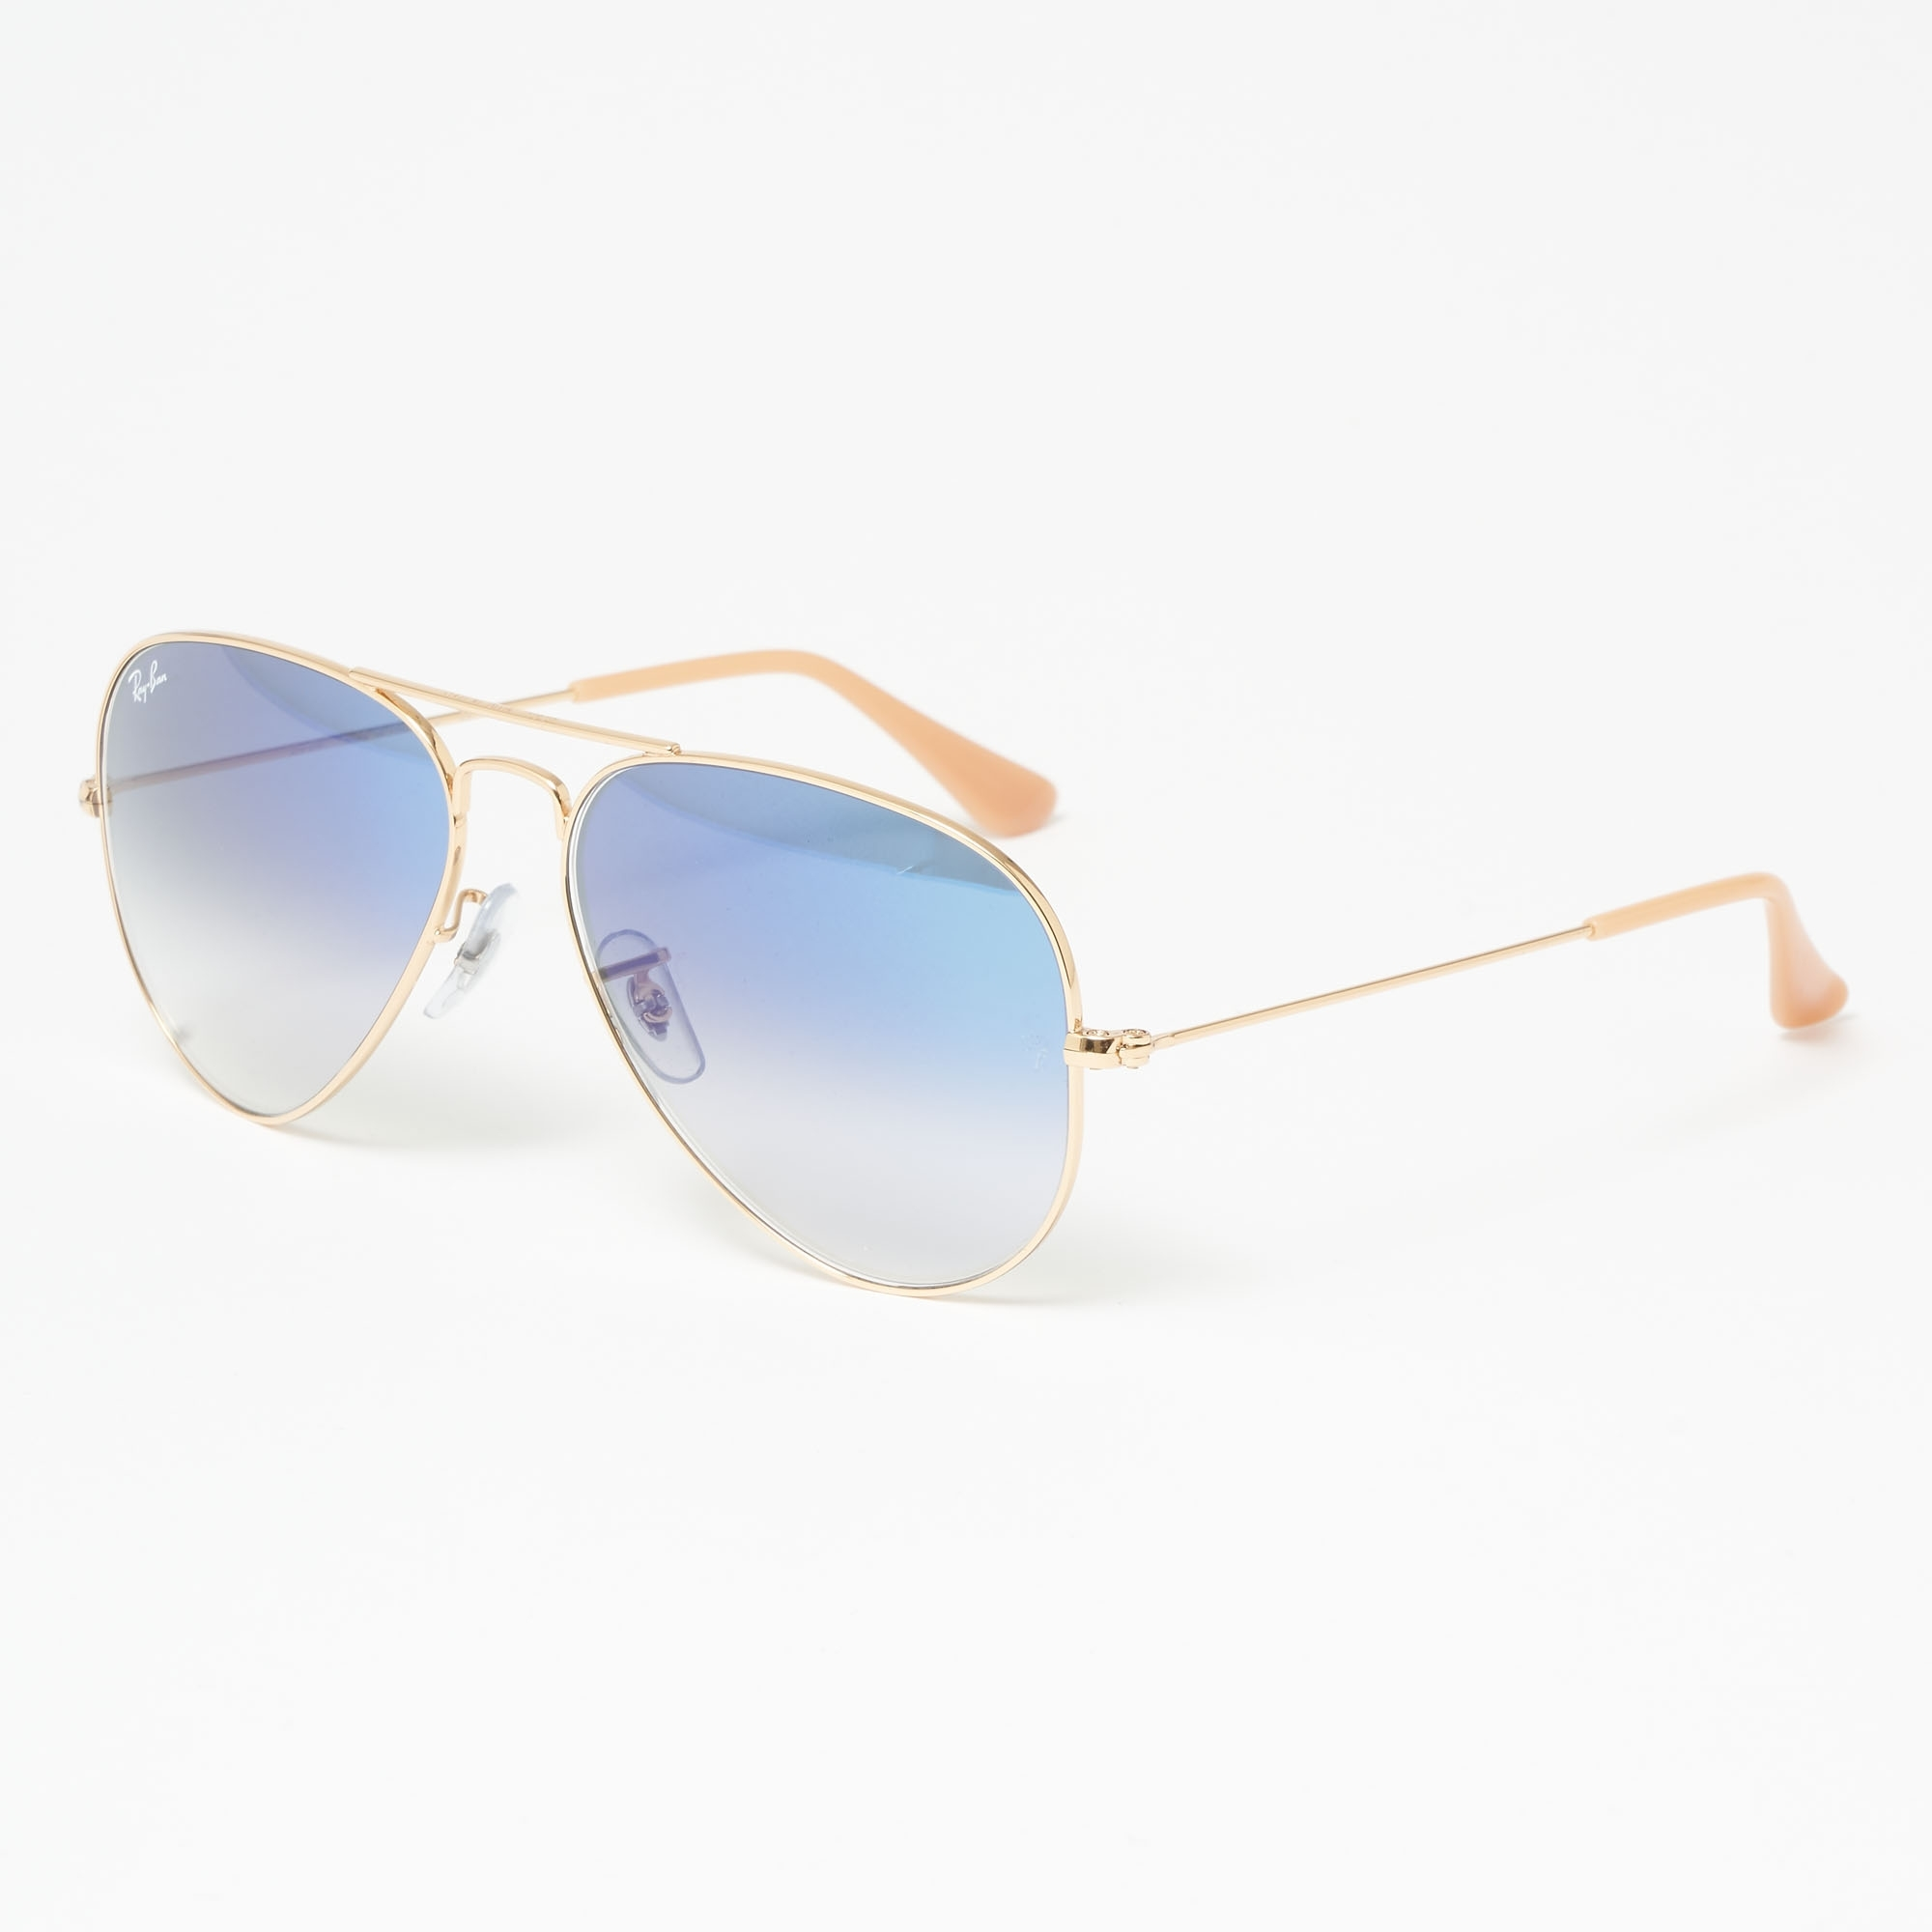 a7c81ffc35 Gold Aviator Gradient Sunglasses - Light Blue Gradient Lenses